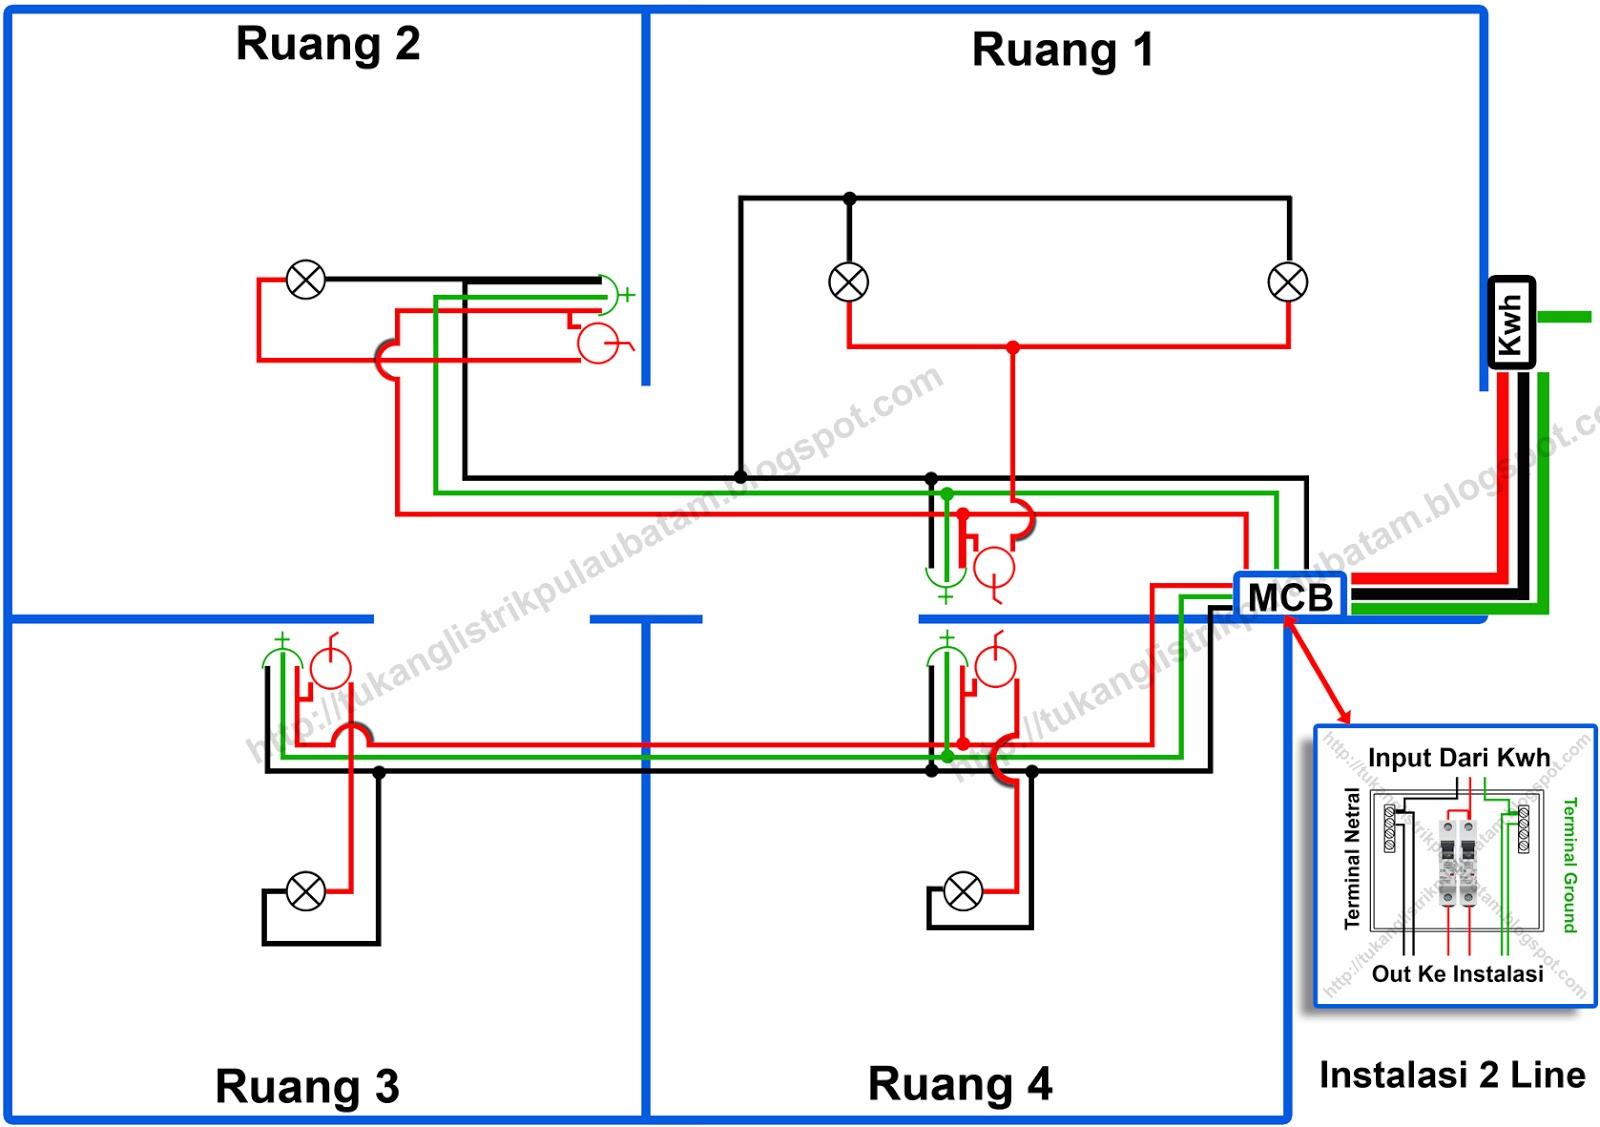 Wiring diagram rumah wire center tukang listrik batam listrik 1 phase rh tukanglistrikpulaubatam blogspot com contoh wiring diagram rumah wiring diagram rumah sederhana cheapraybanclubmaster Choice Image